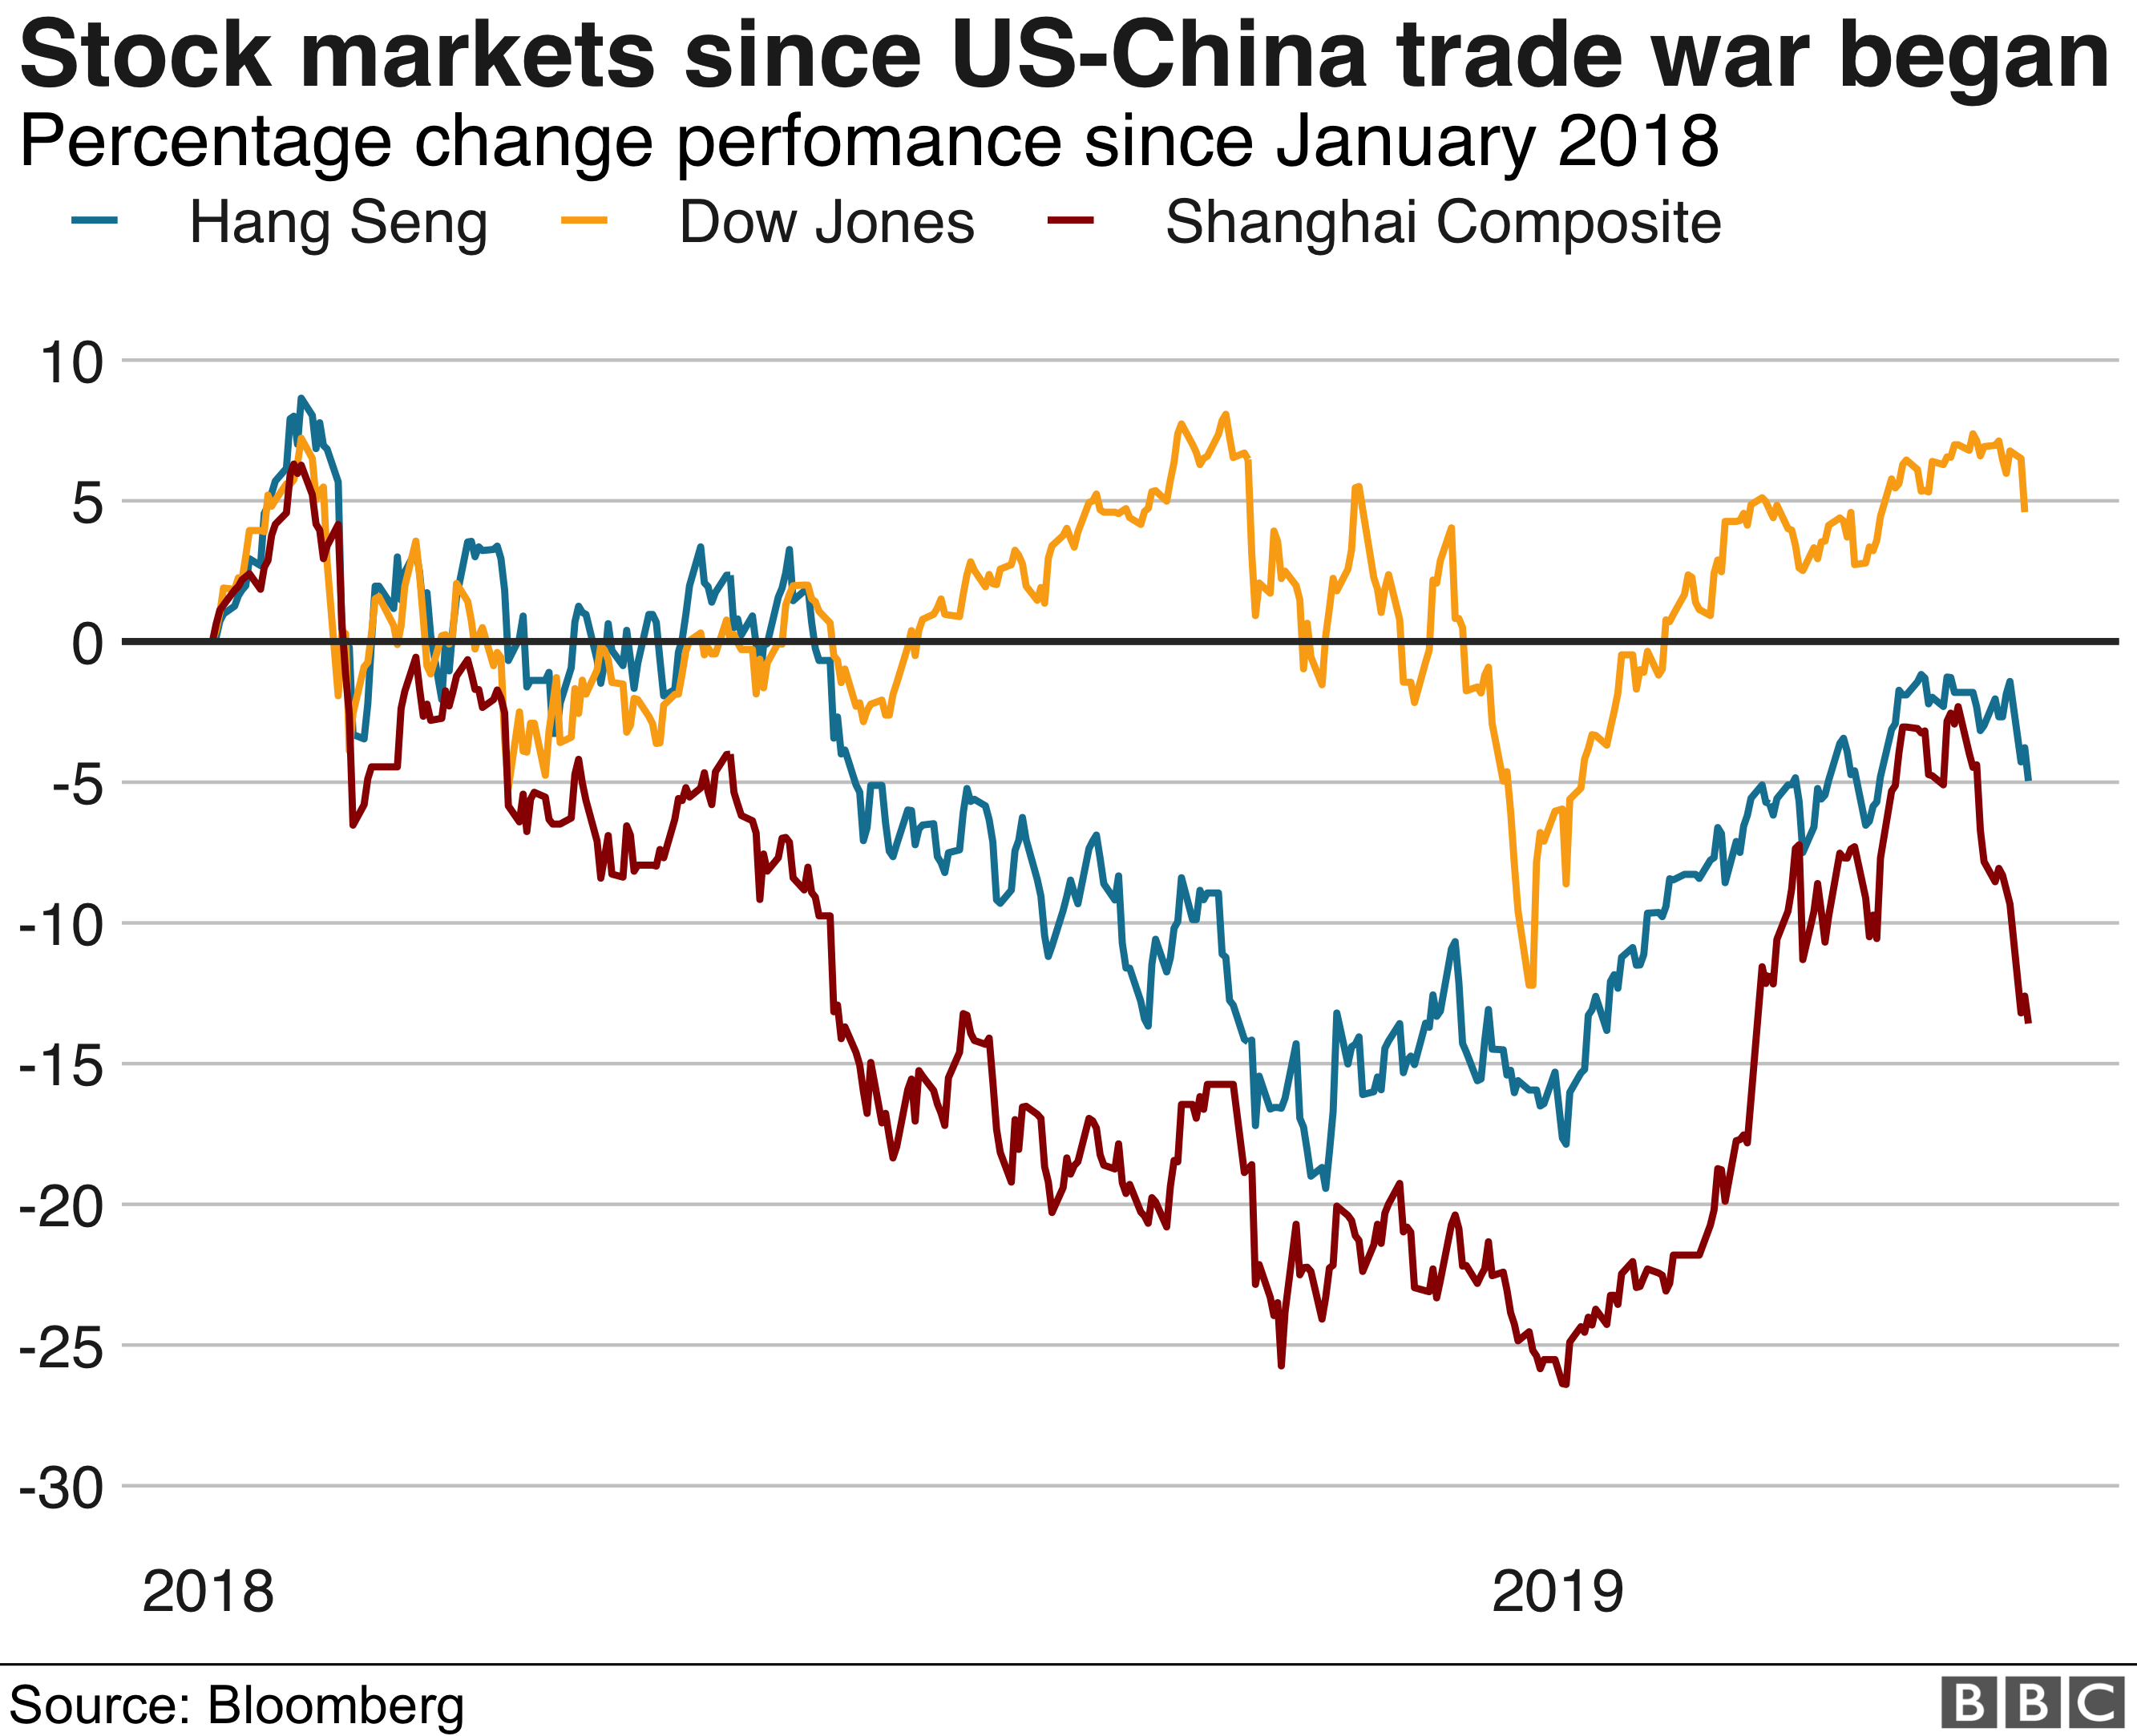 Stock markets reaction to trade war